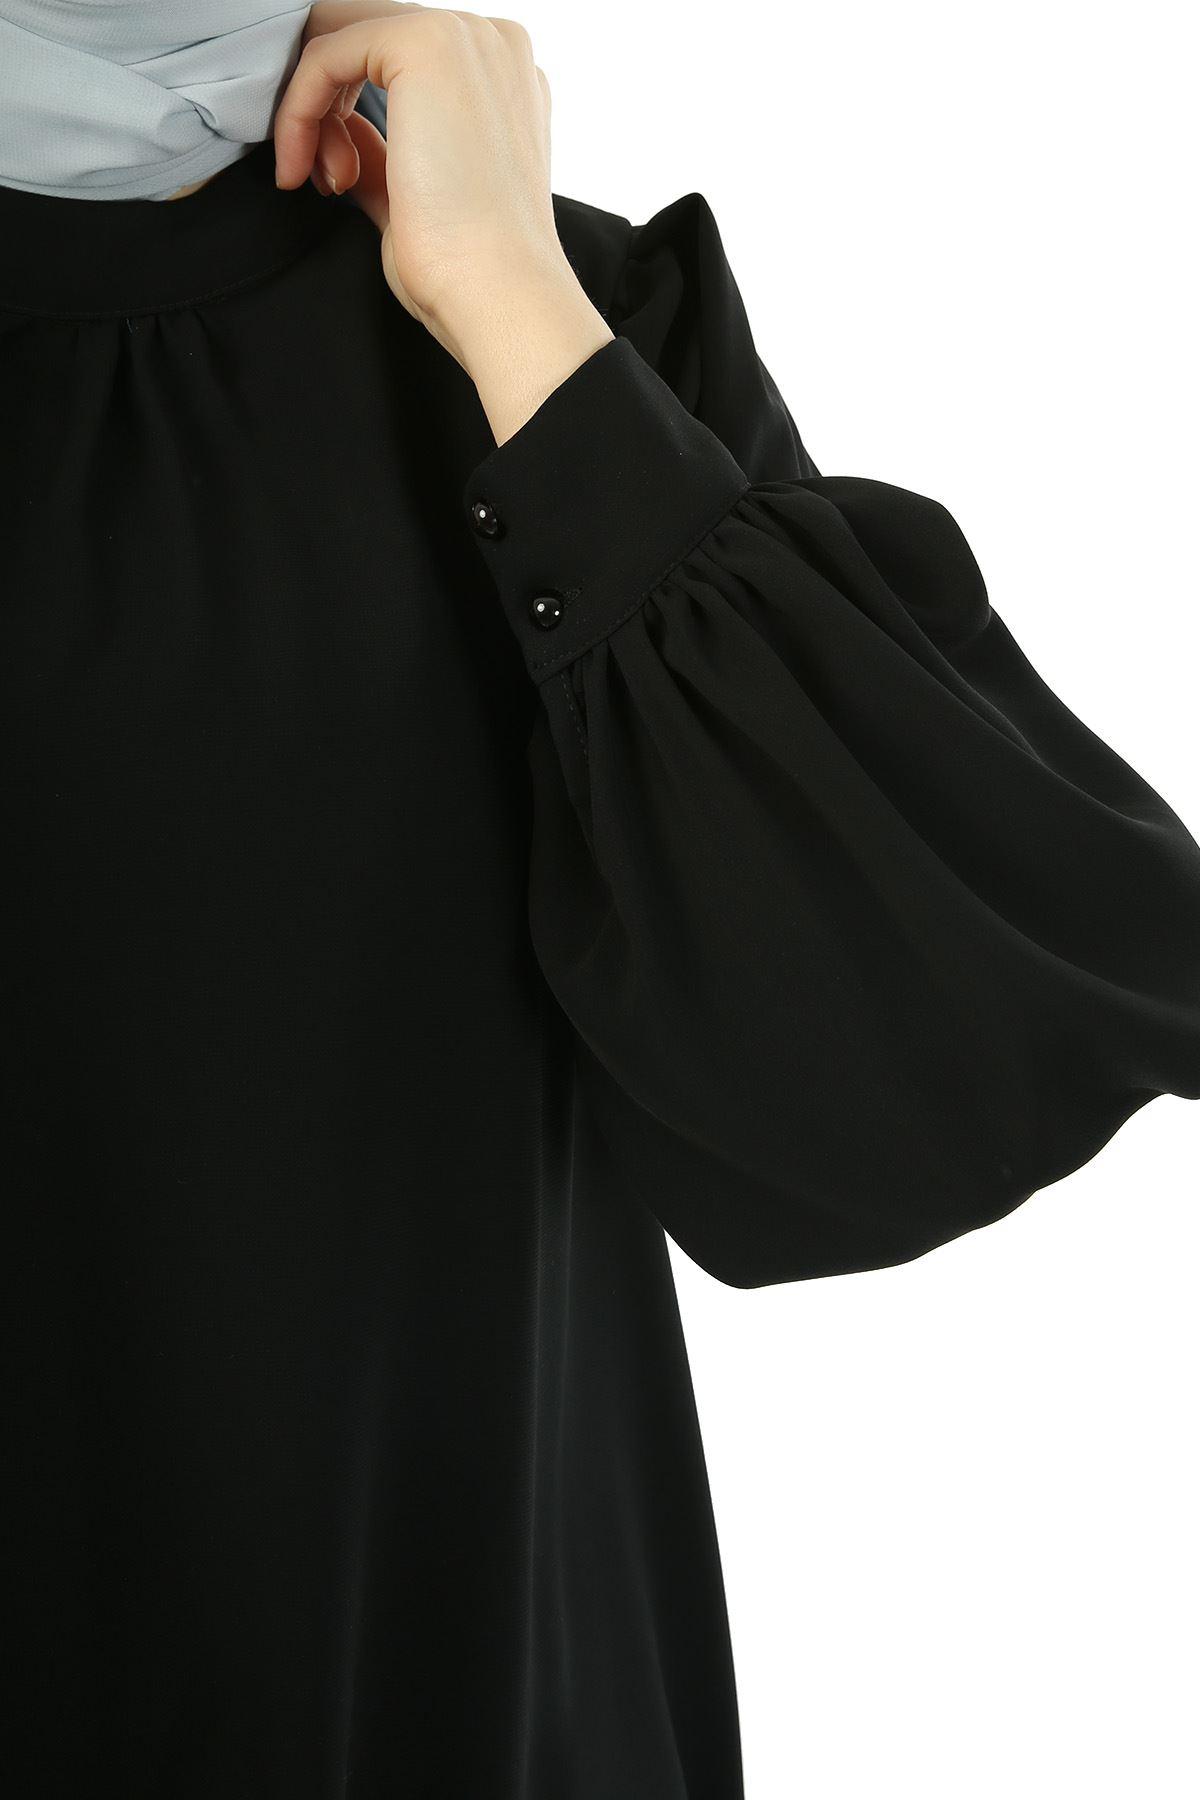 Ön Büzgü Detay Balon Kol Tunik-Siyah